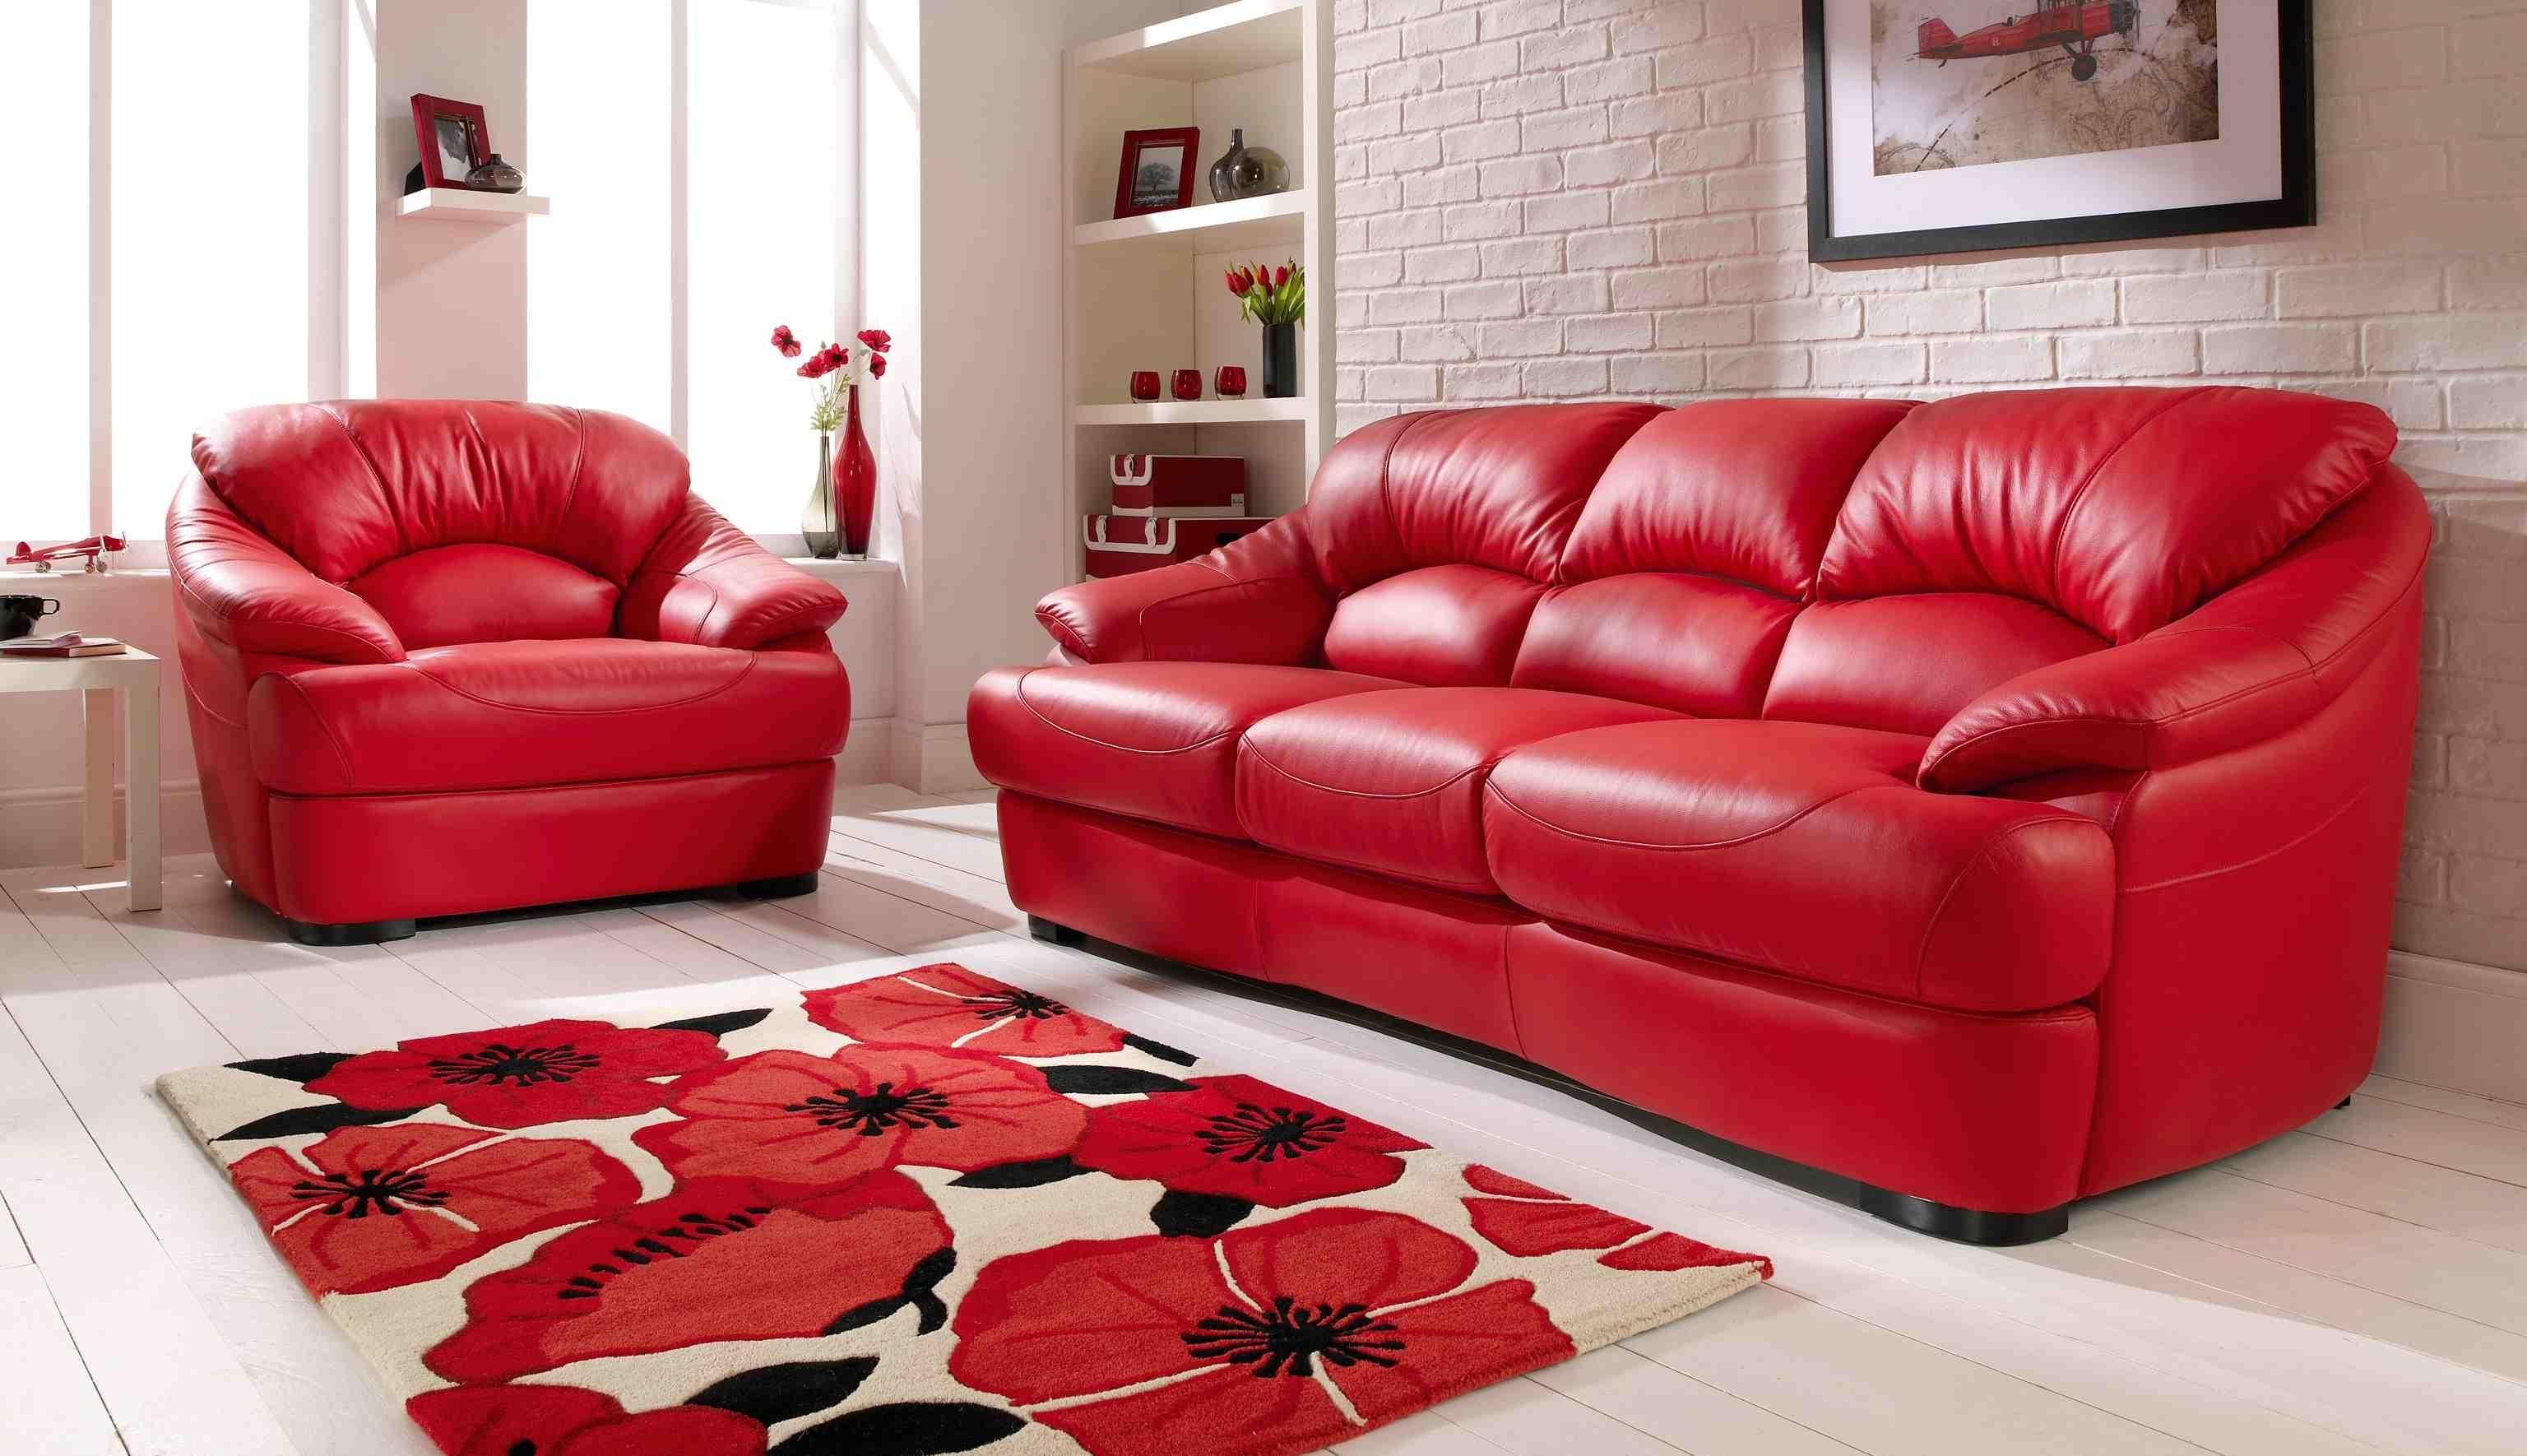 Sofas Center : Unusual Red Leatherofa Pictures Design Corneralered Inside Unusual Sofas (Image 12 of 20)